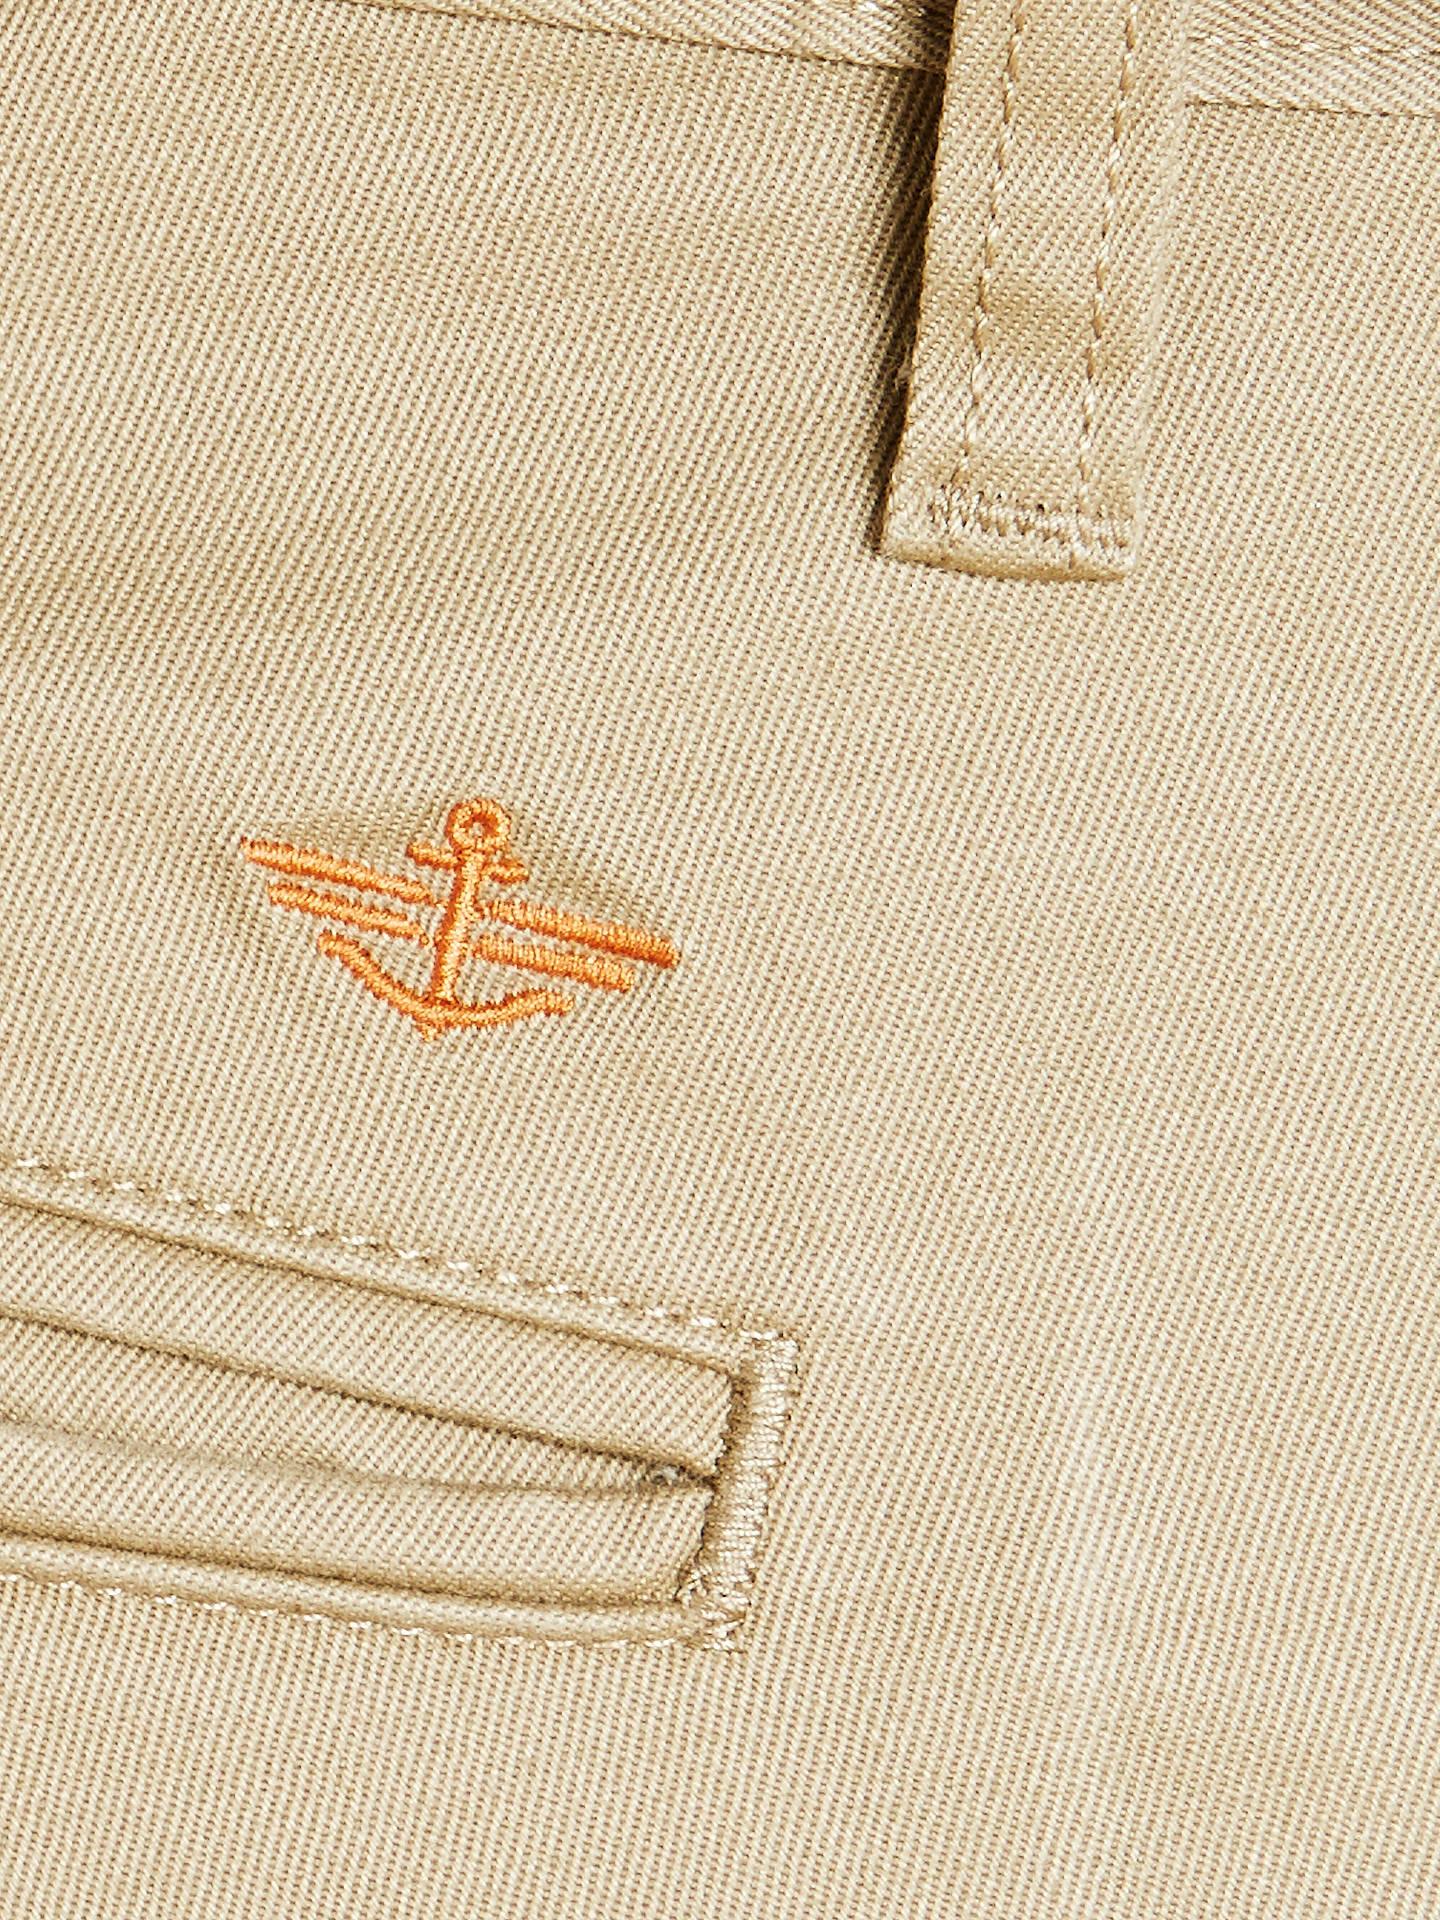 Dockers Alpha Stretch Twill Slim Tapered Trousers, New